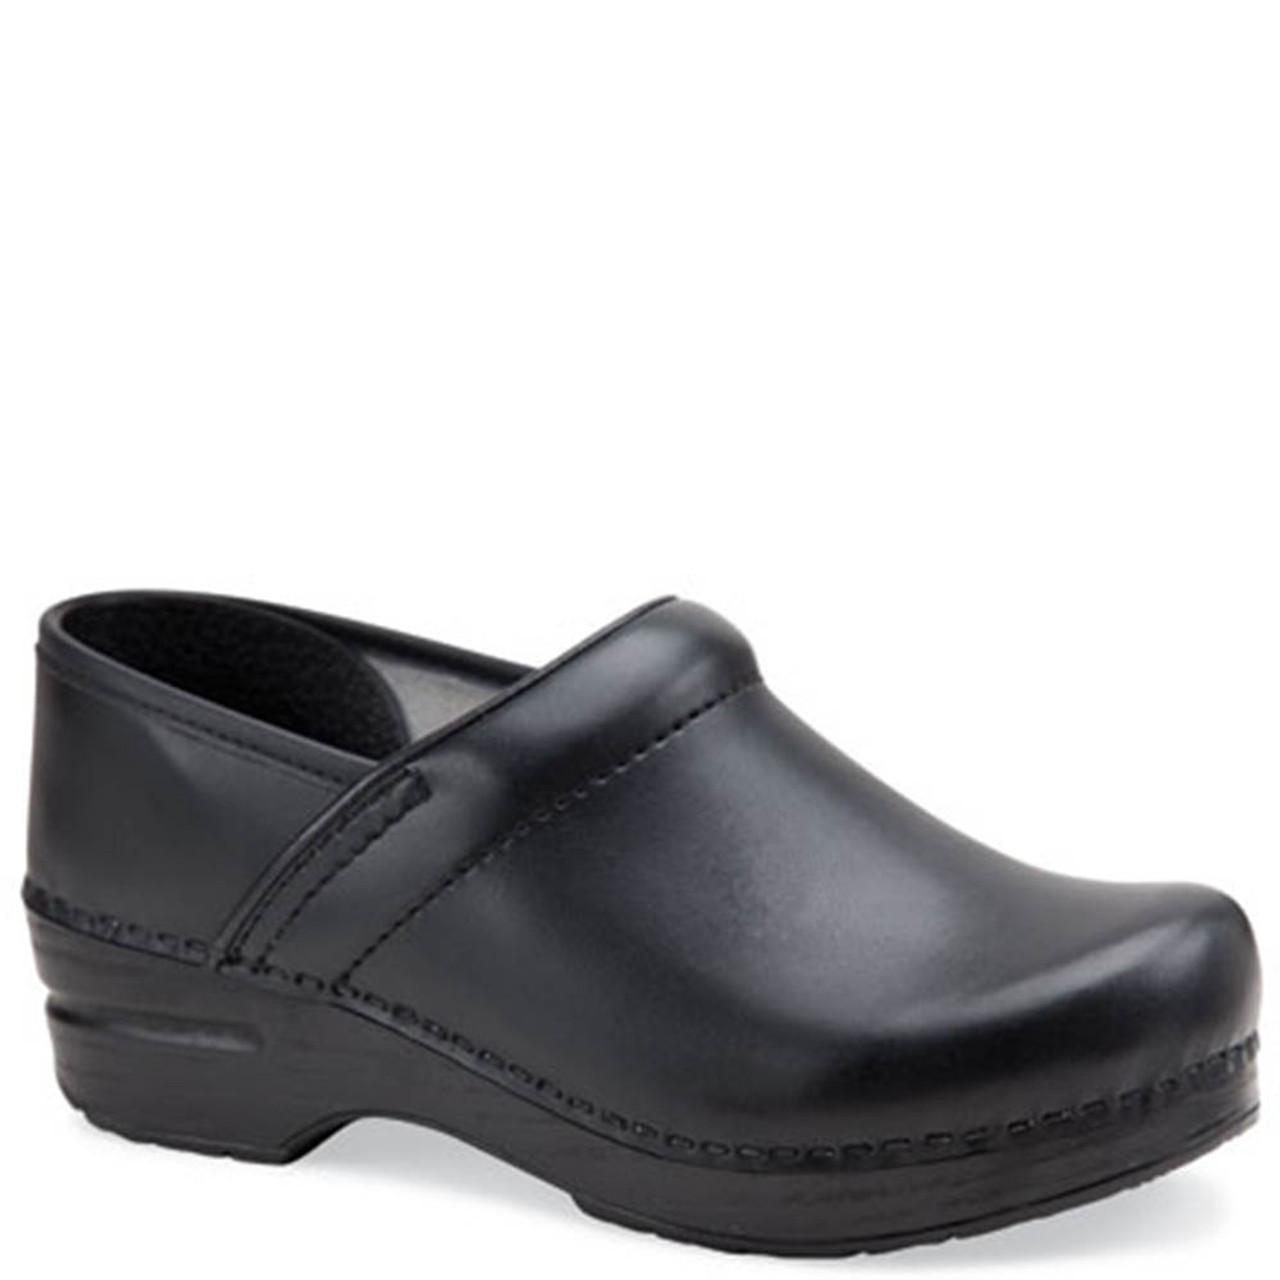 Dansko Shoes Headquarters